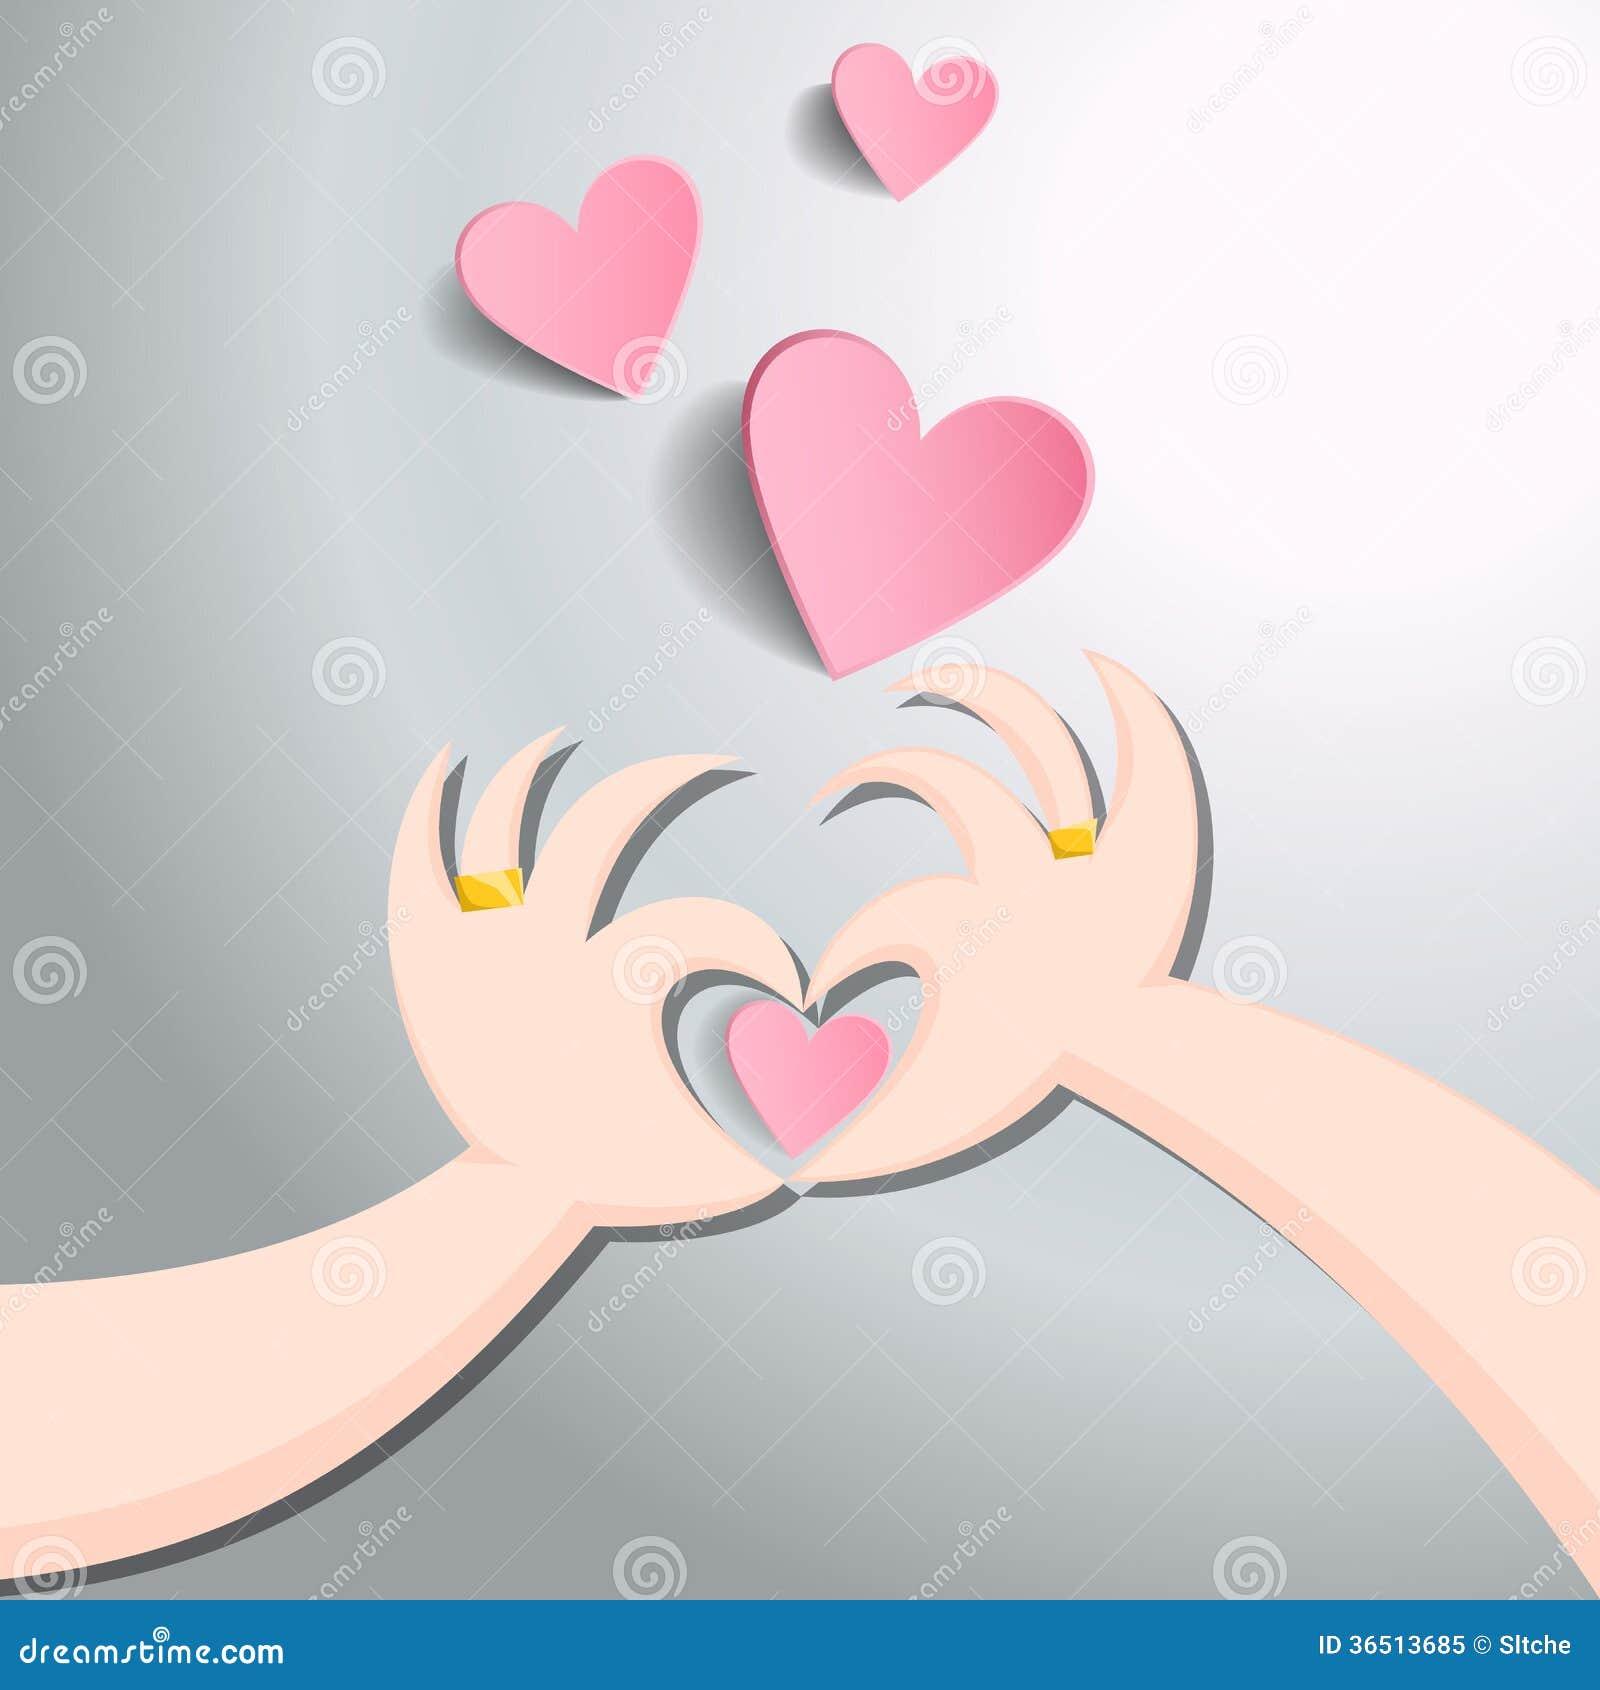 Vecteur de geste de coeur de main